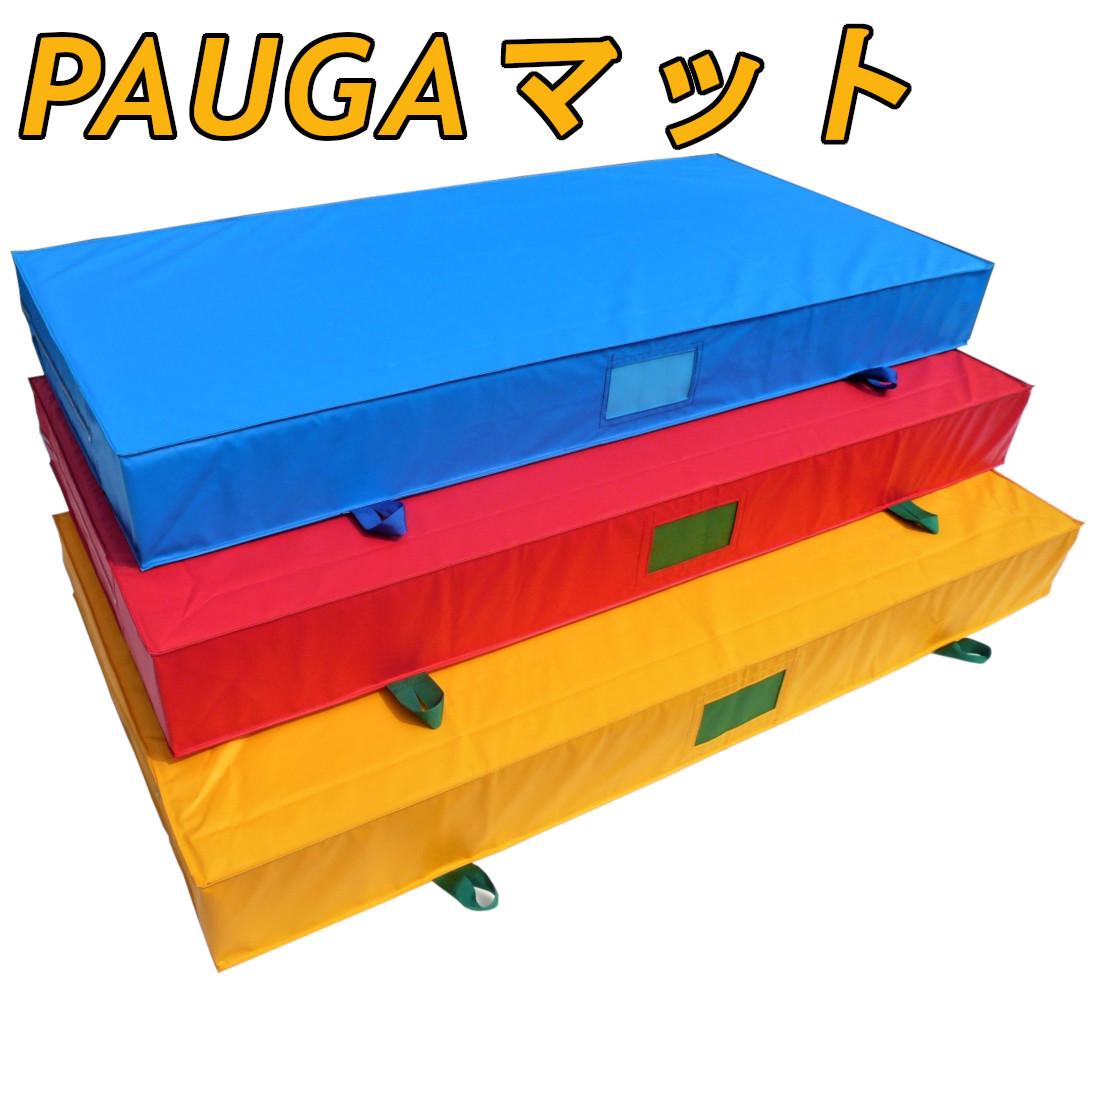 PAUGA1.JPG